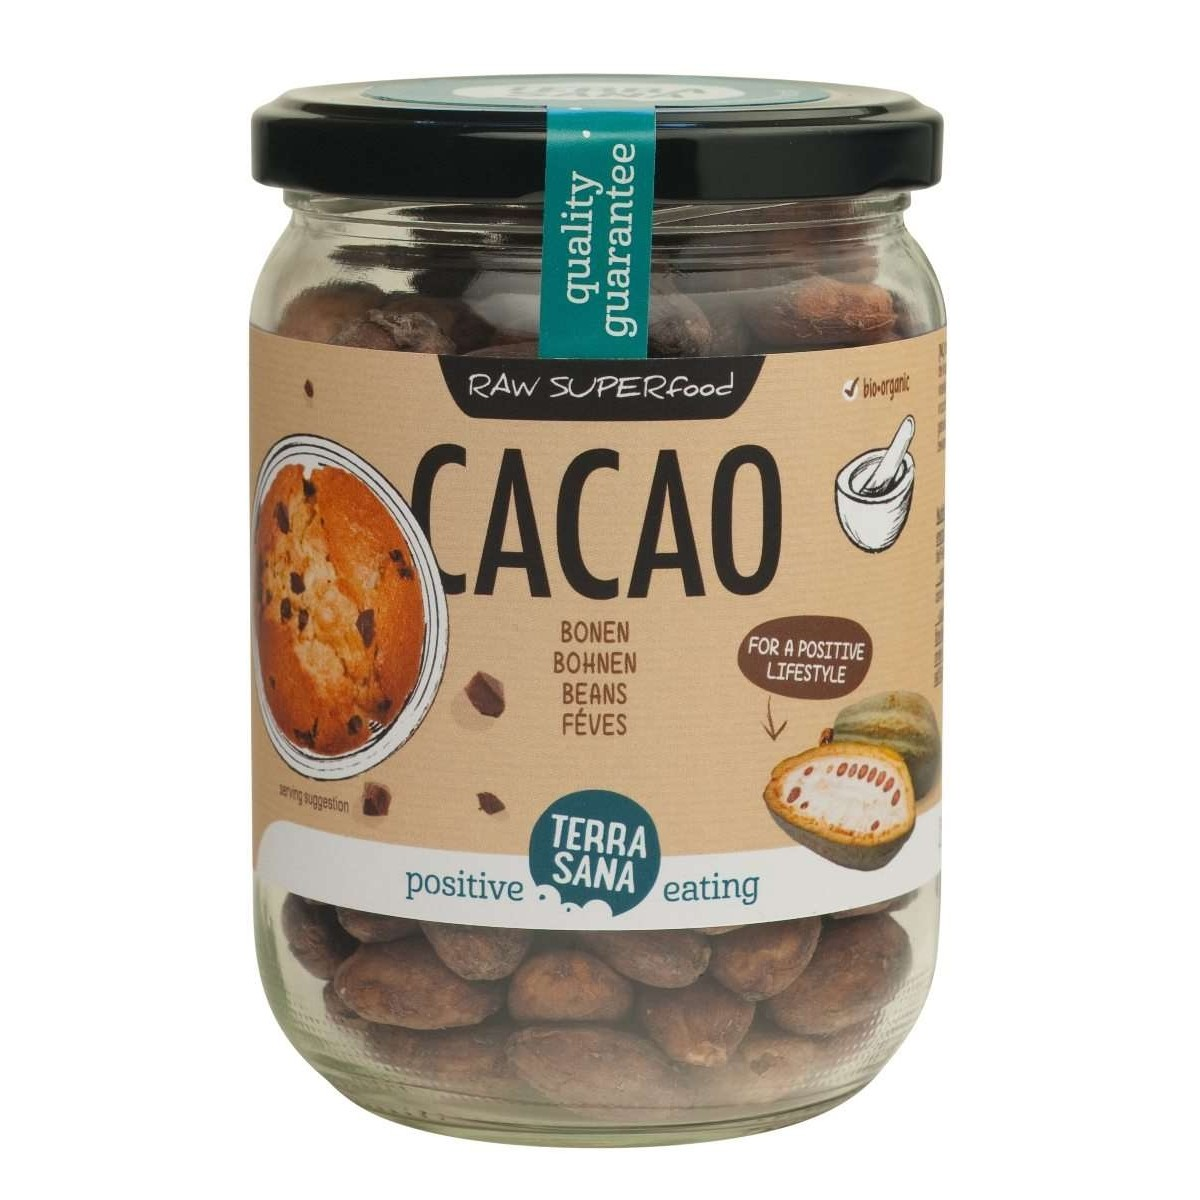 Cacaobonen (glas)